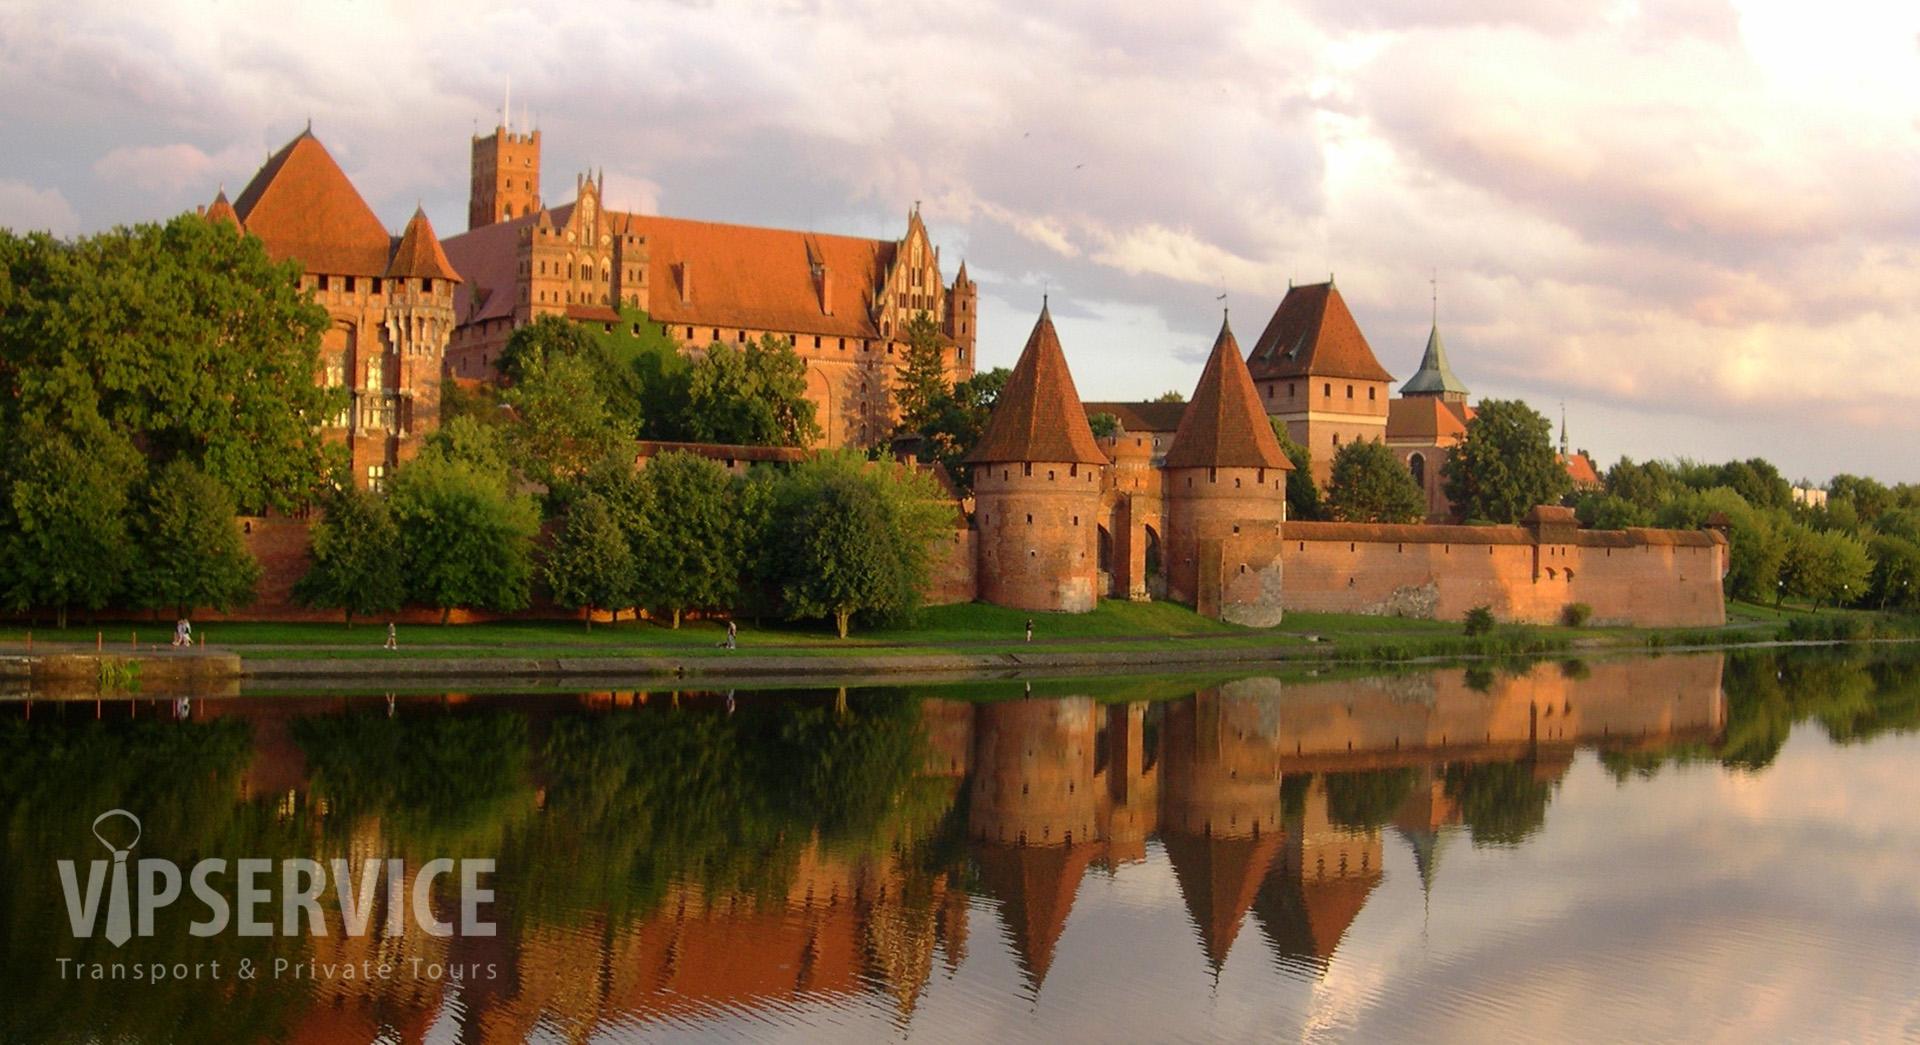 Malbork Castle / Zamek w Malborku